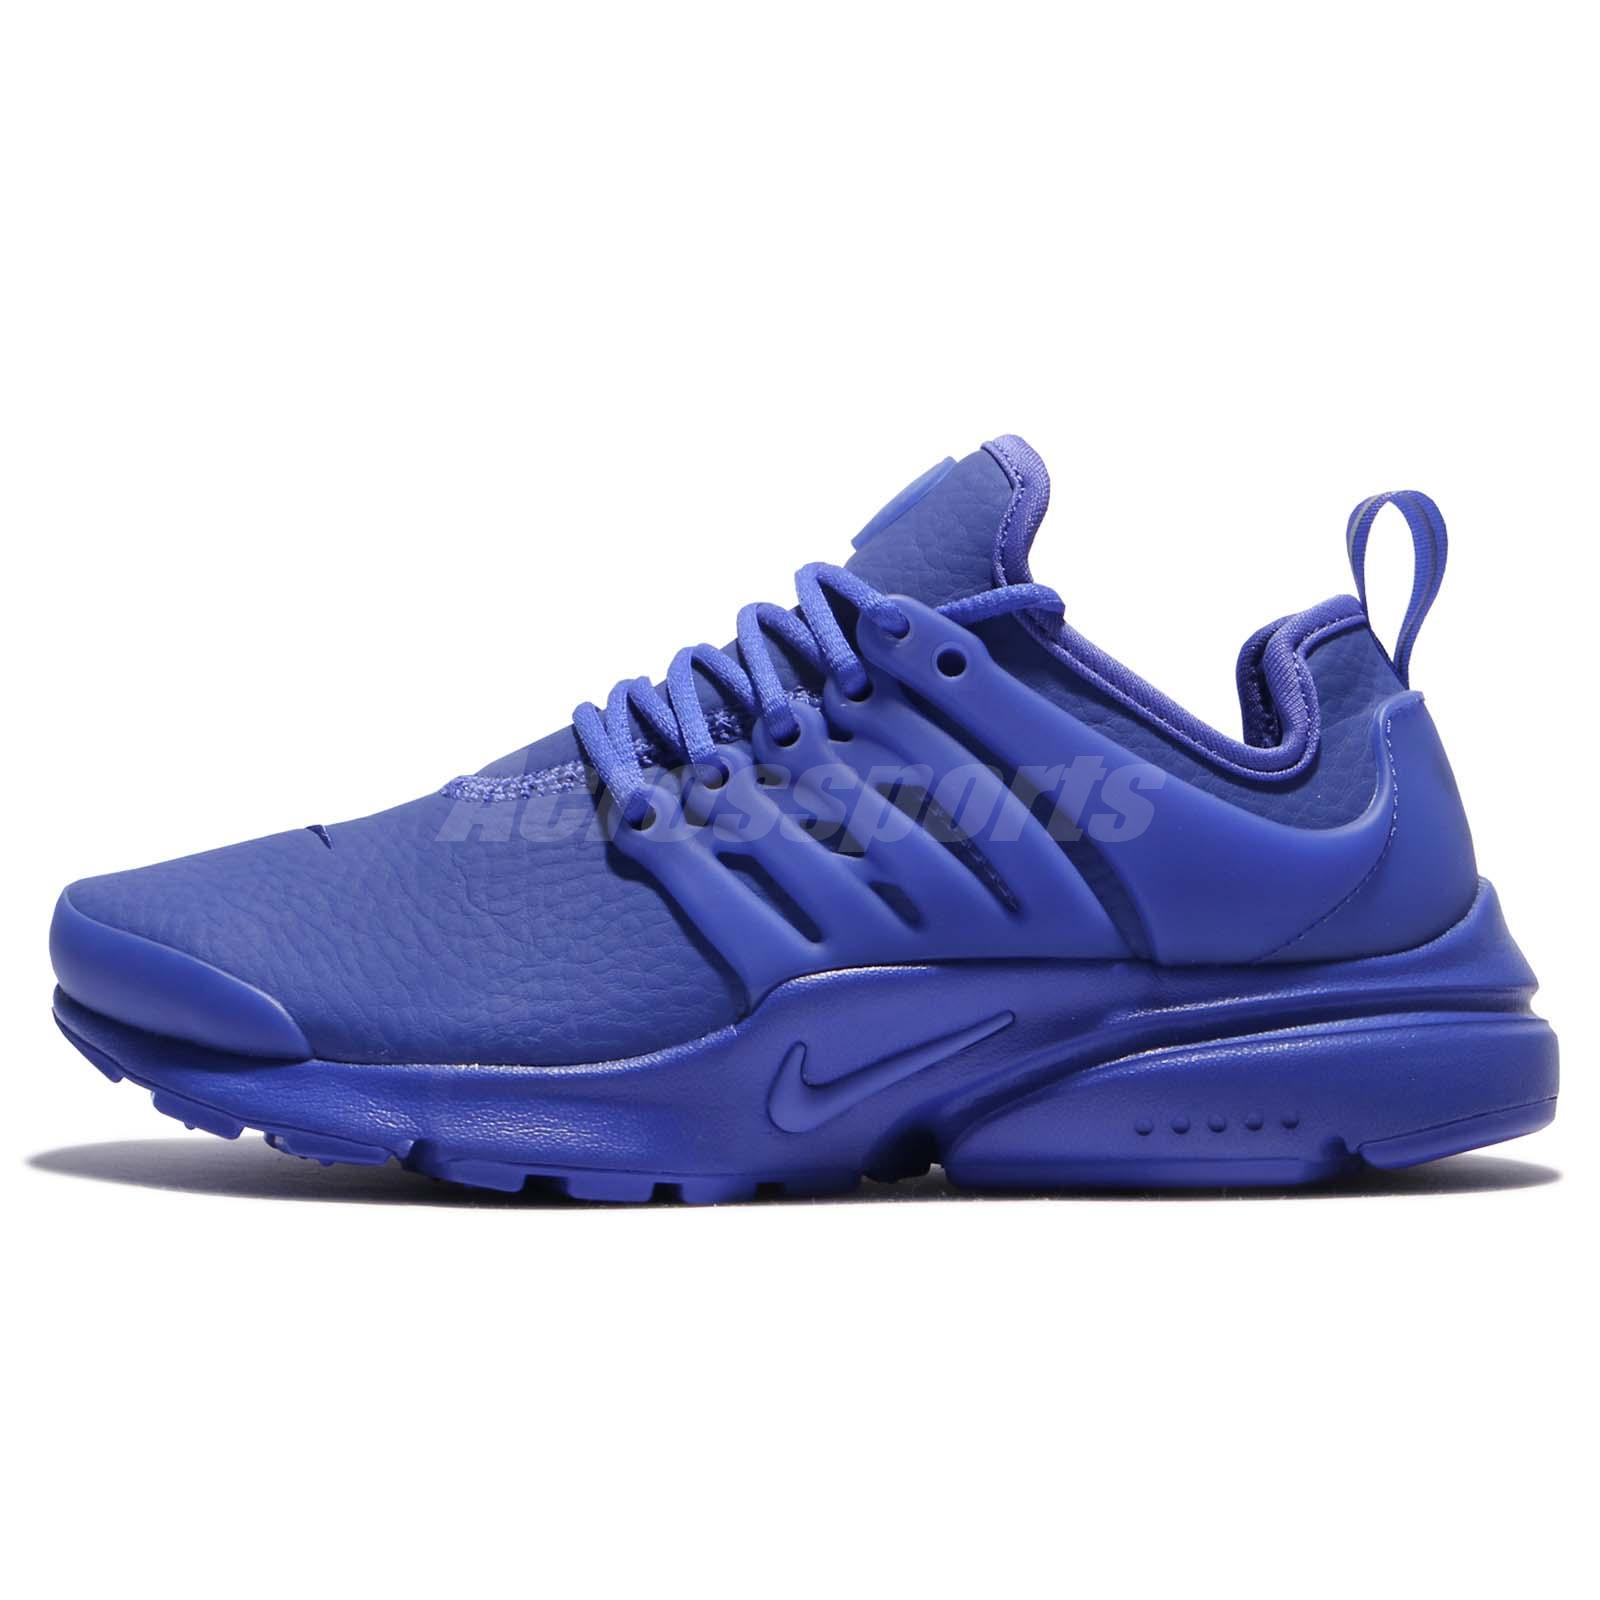 low priced dadd6 84052 Nike Wmns Air Presto PRM Triple Paramount Blue Leather Women Shoe 878071-401